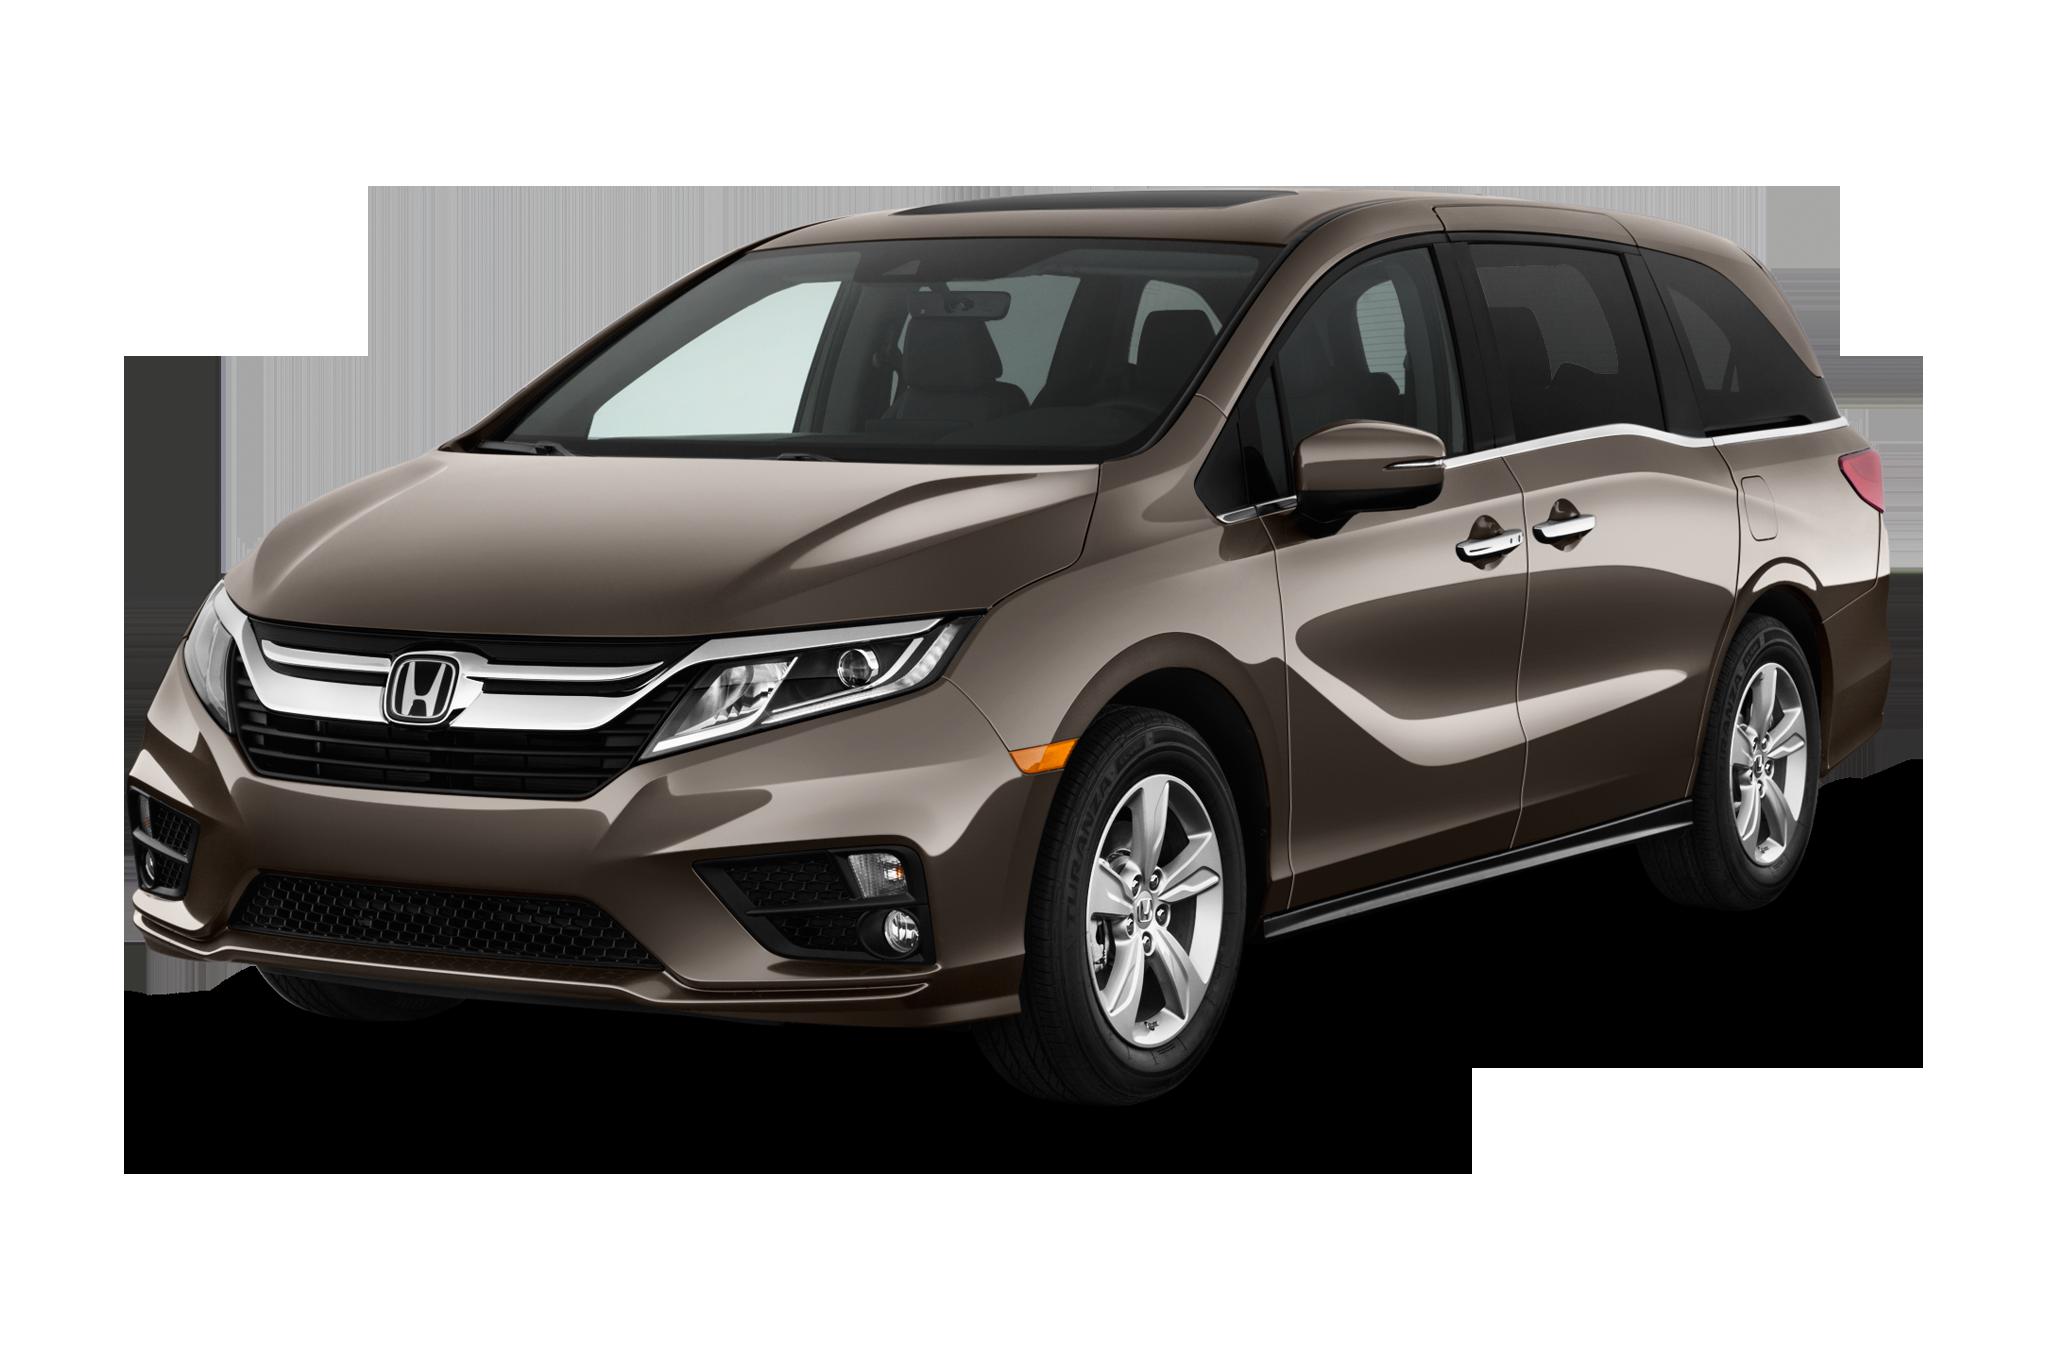 Honda Dealers Nj >> Honda Dealership Chicago | New Car Release Information